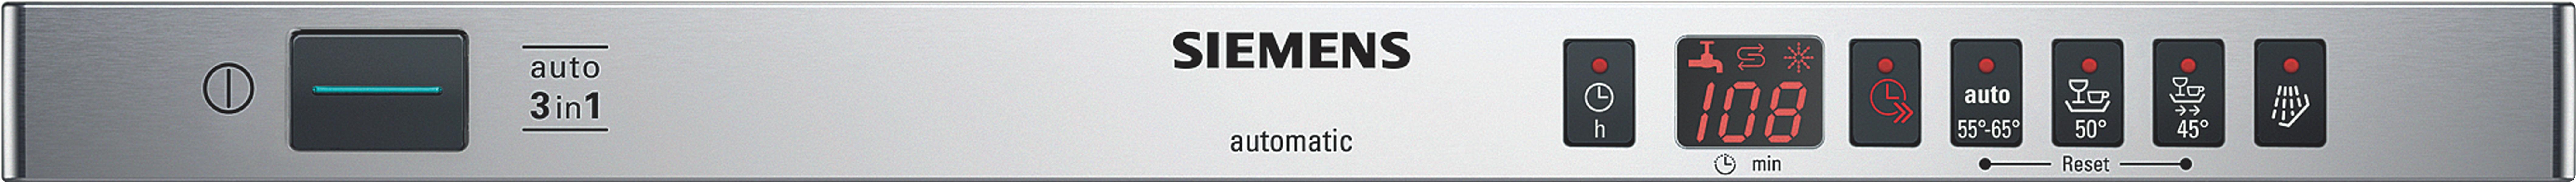 Masini de spalat vase incorporabile SIEMENS - Poza 1